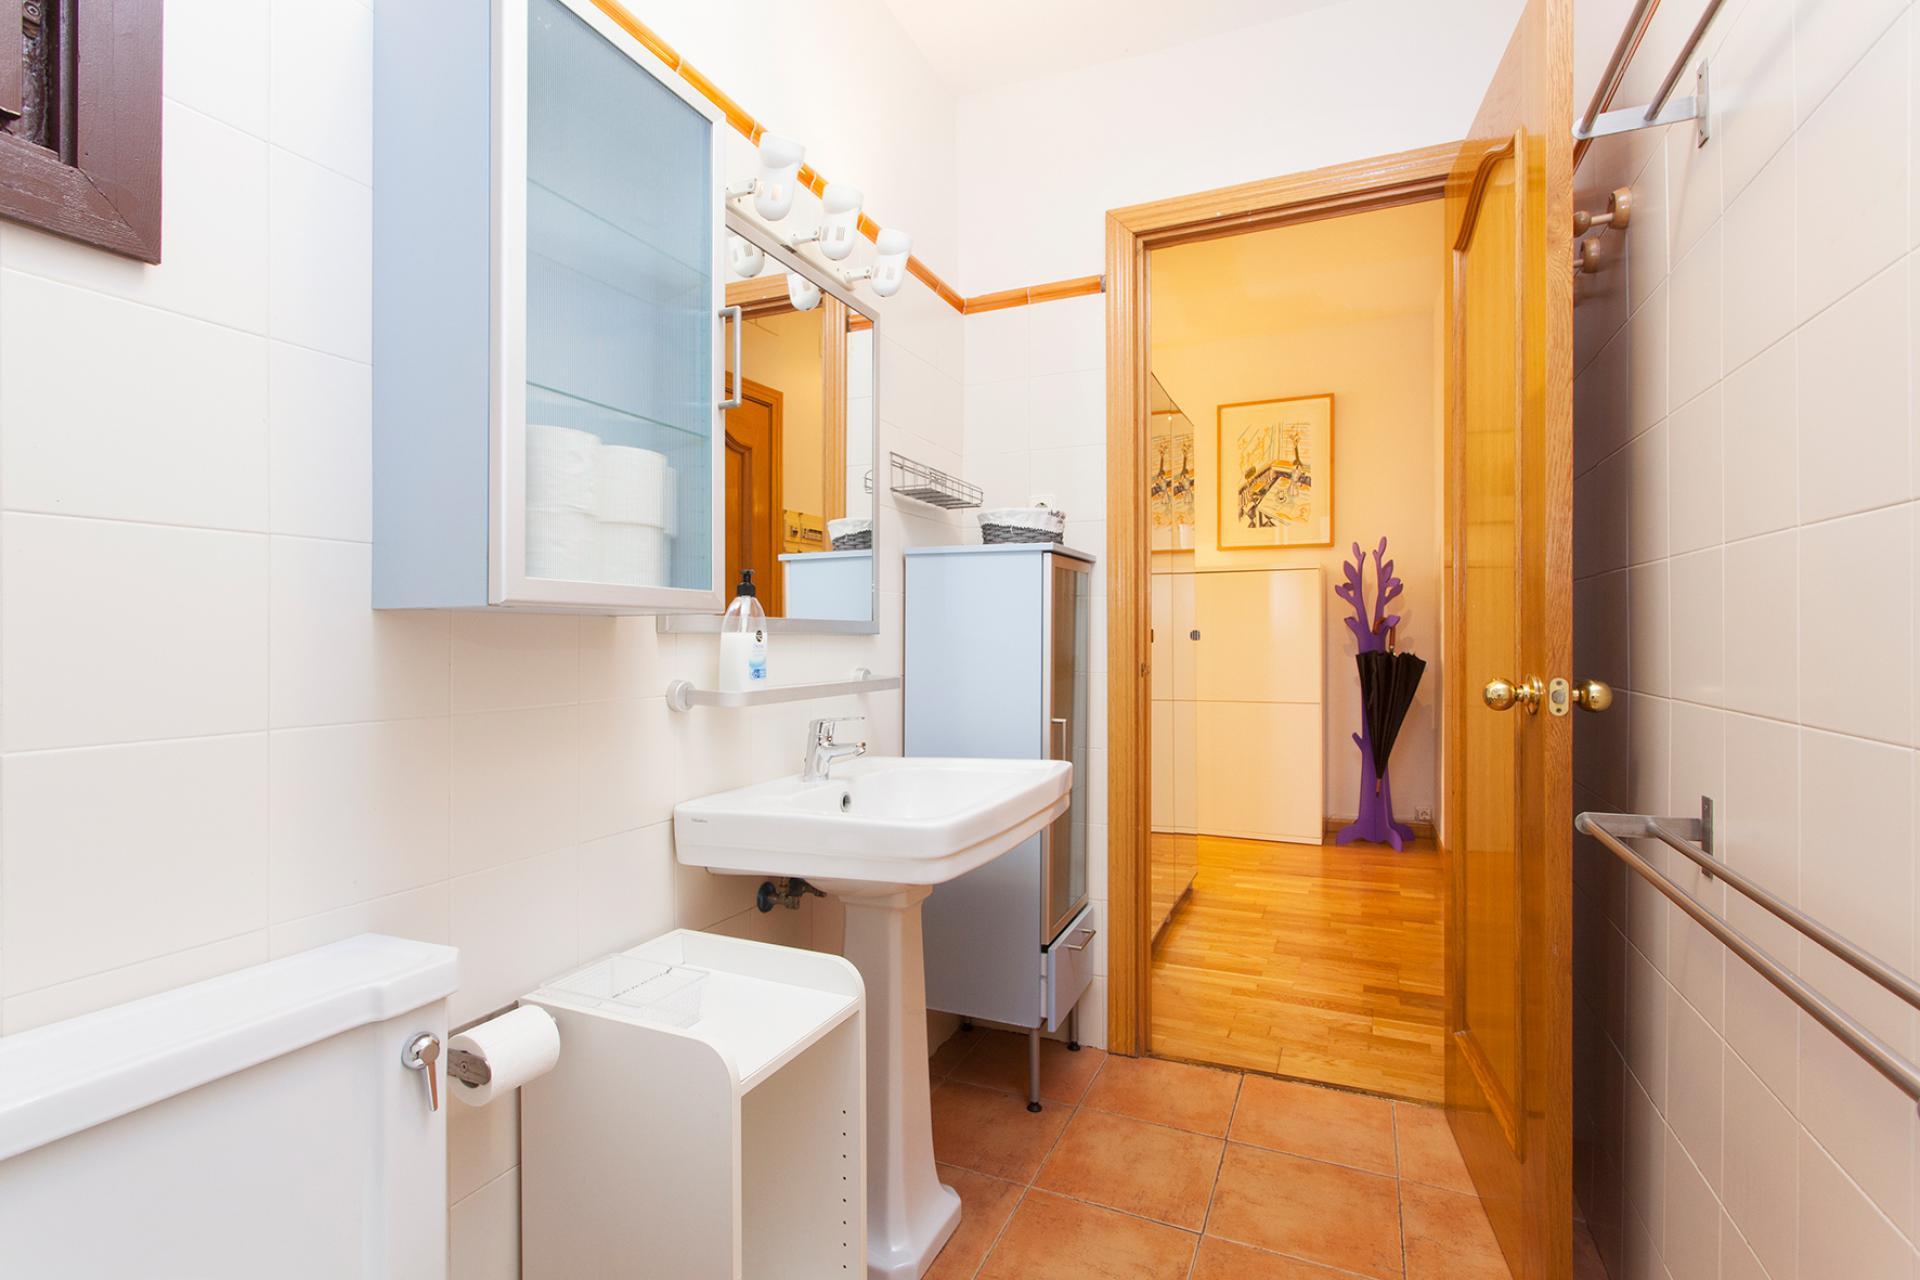 Shbarcelona piso de alquiler en pleno barrio g tico for Pisos alquiler los barrios